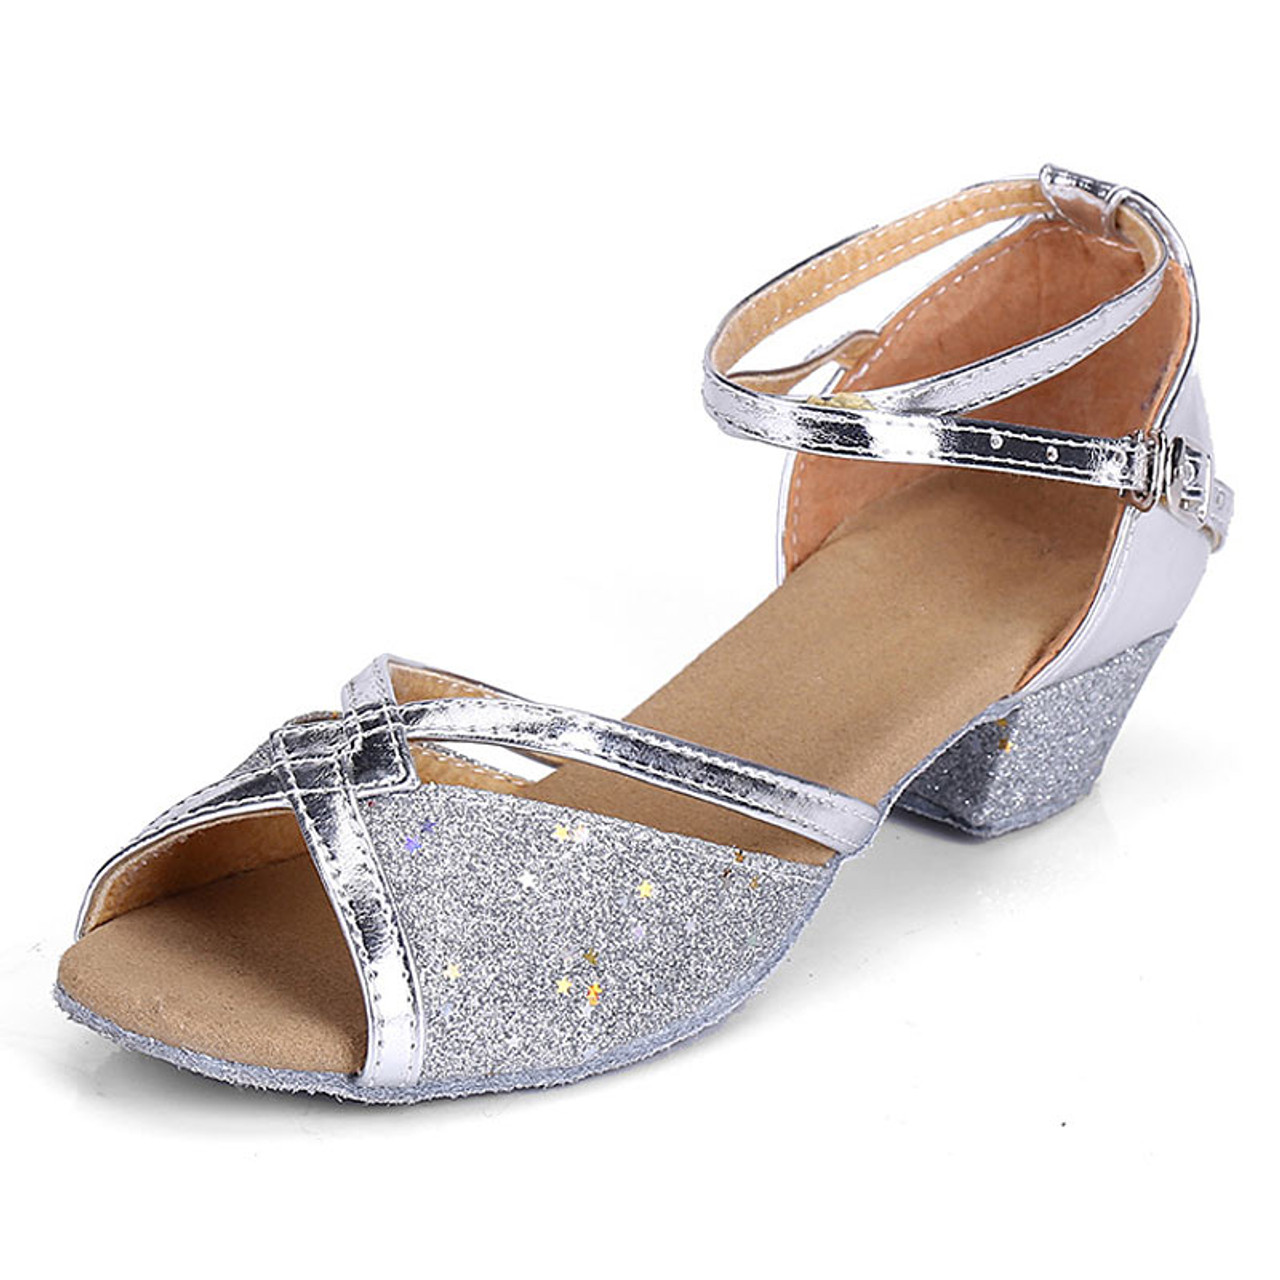 Brand New Women Children Girl/'s Ballroom Latin Tango Dance Shoes heeled SalsaWZJ